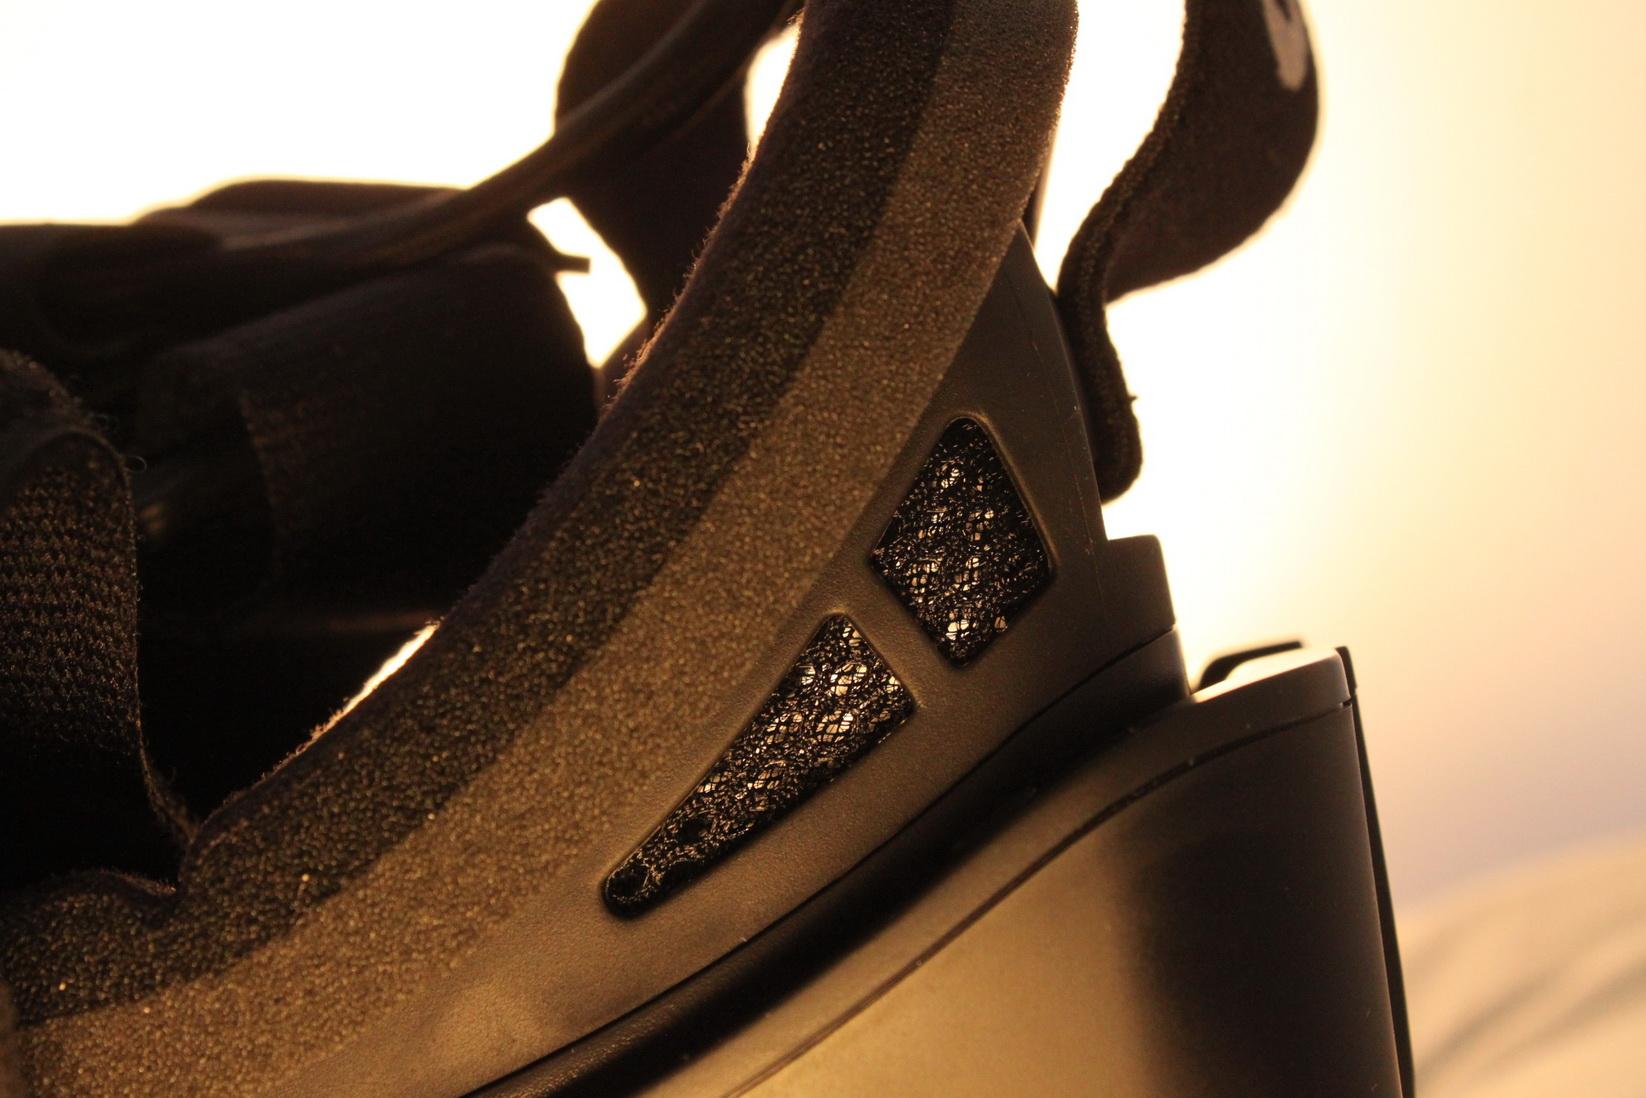 OculusRiftDK2 Gameblog 240